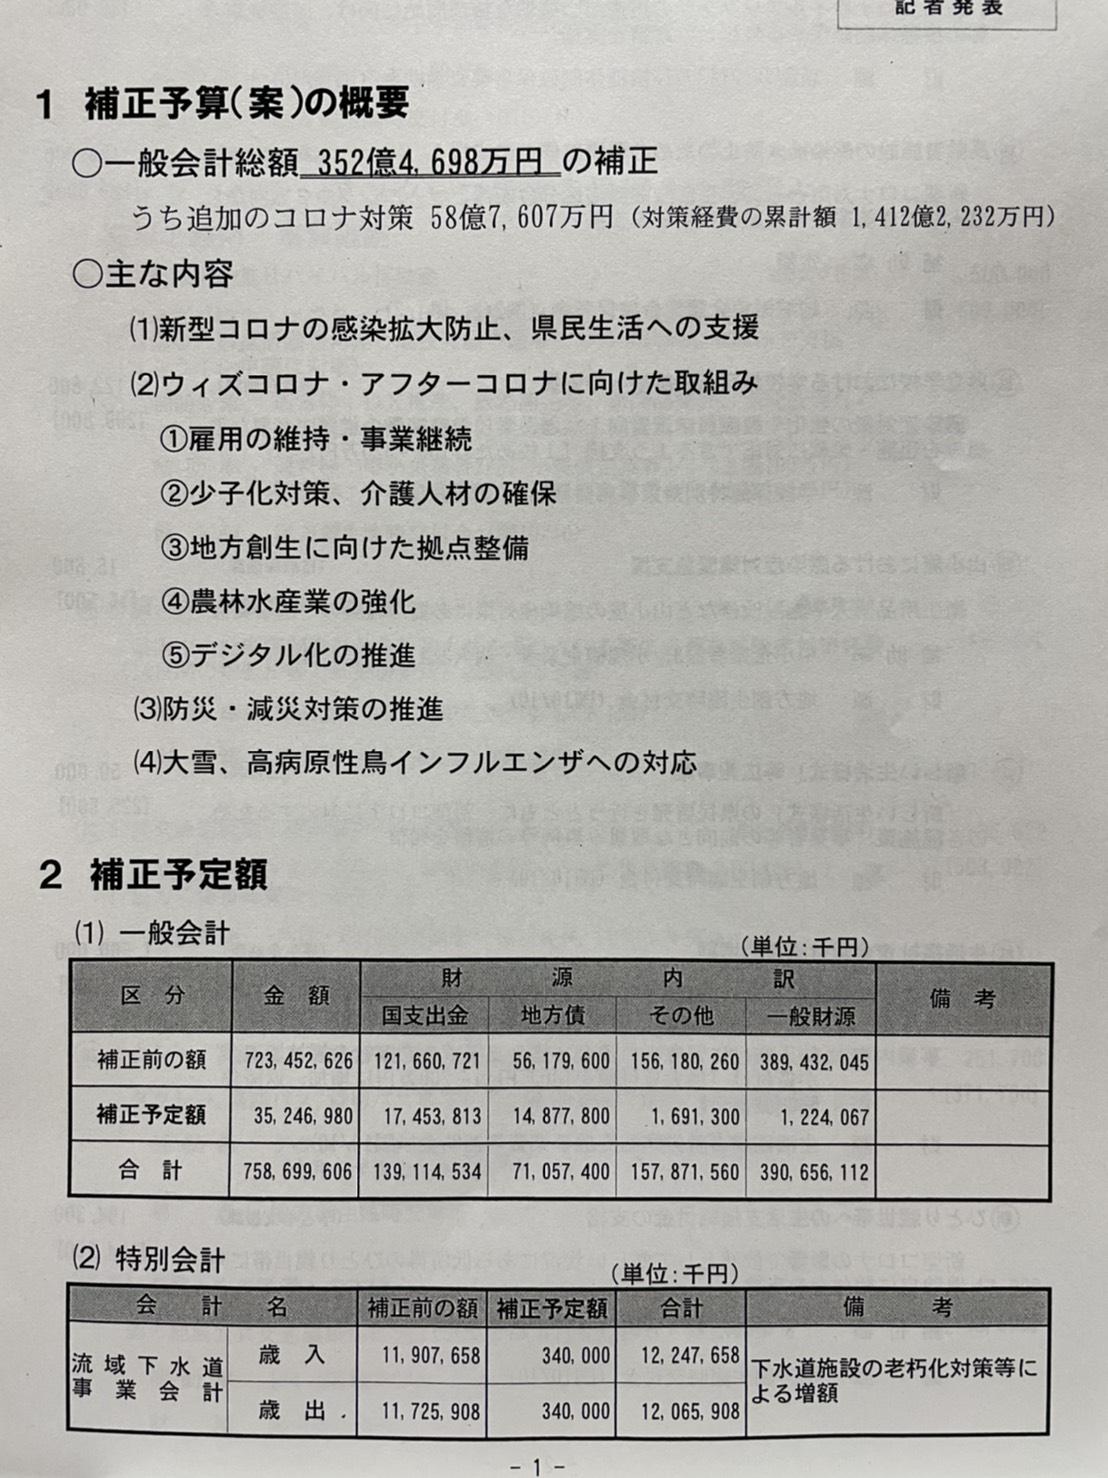 令和2年度2月補正予算(案)